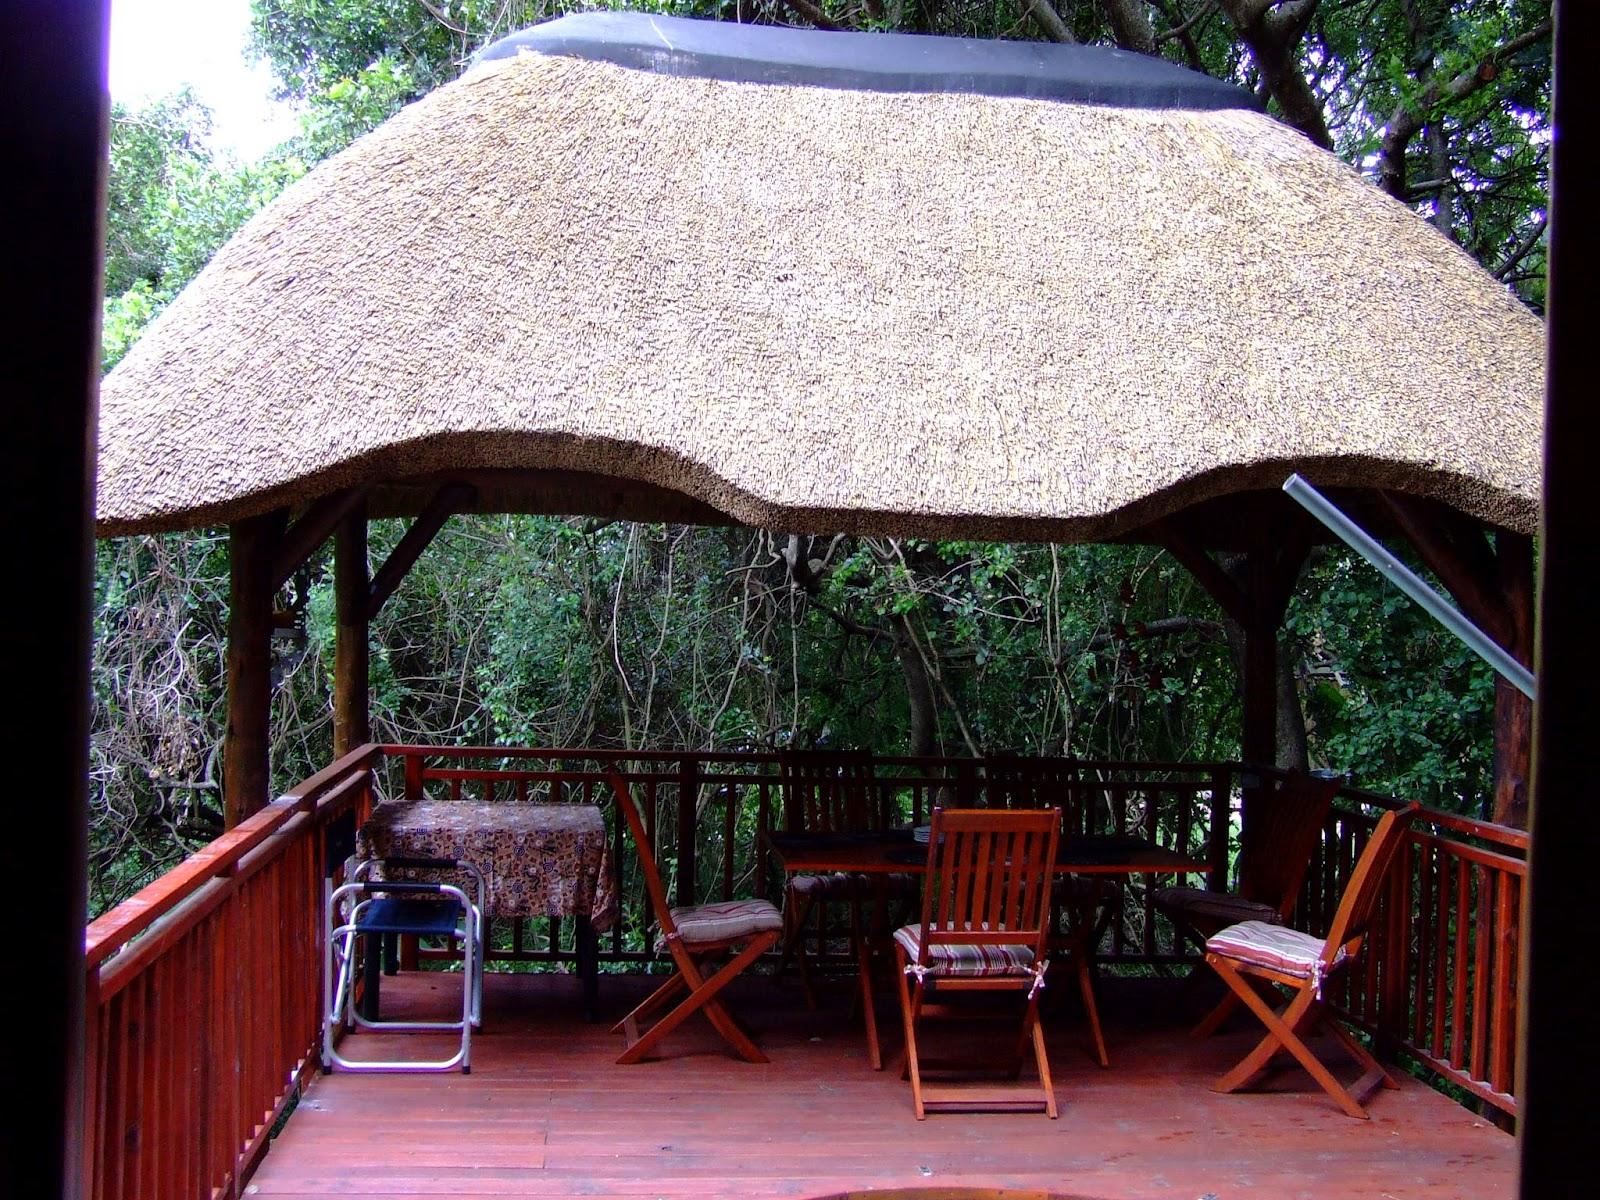 Thatch Lapa, Braai & Outdoor Entertainment Area Designs on Small Backyard Entertainment Area Ideas id=36044